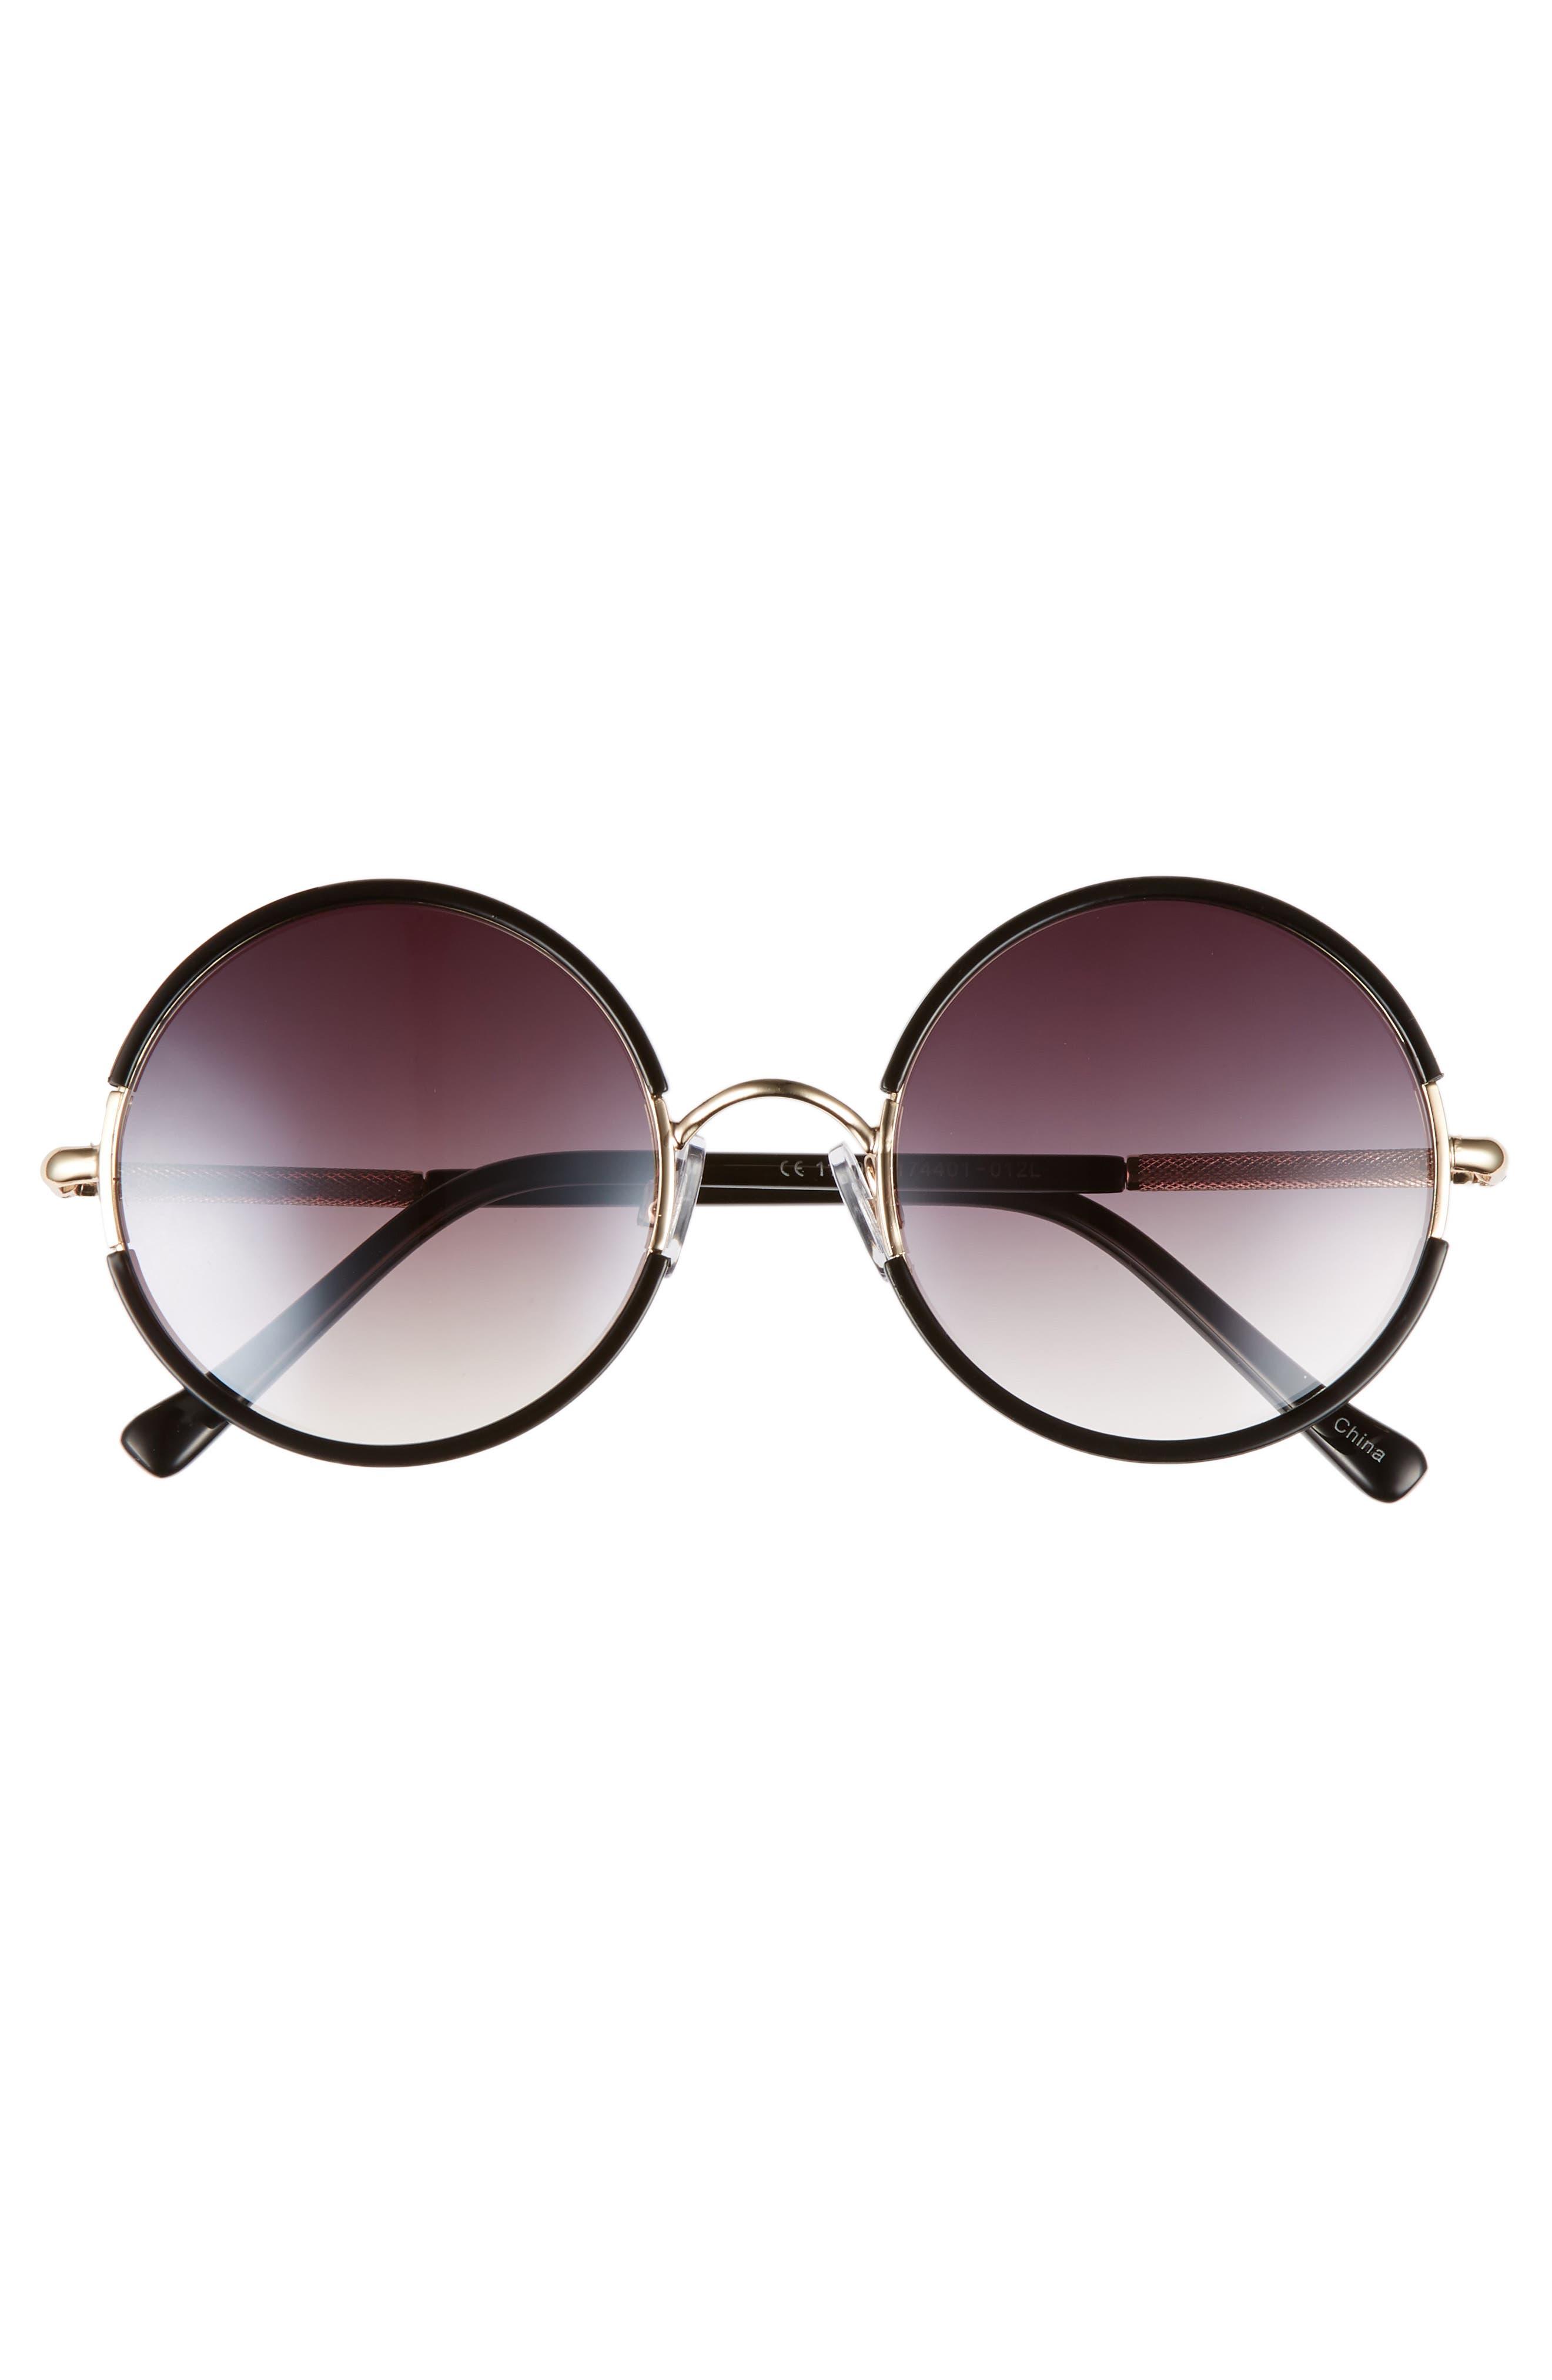 52mm Gradient Round Sunglasses,                             Alternate thumbnail 3, color,                             Black/ Gold